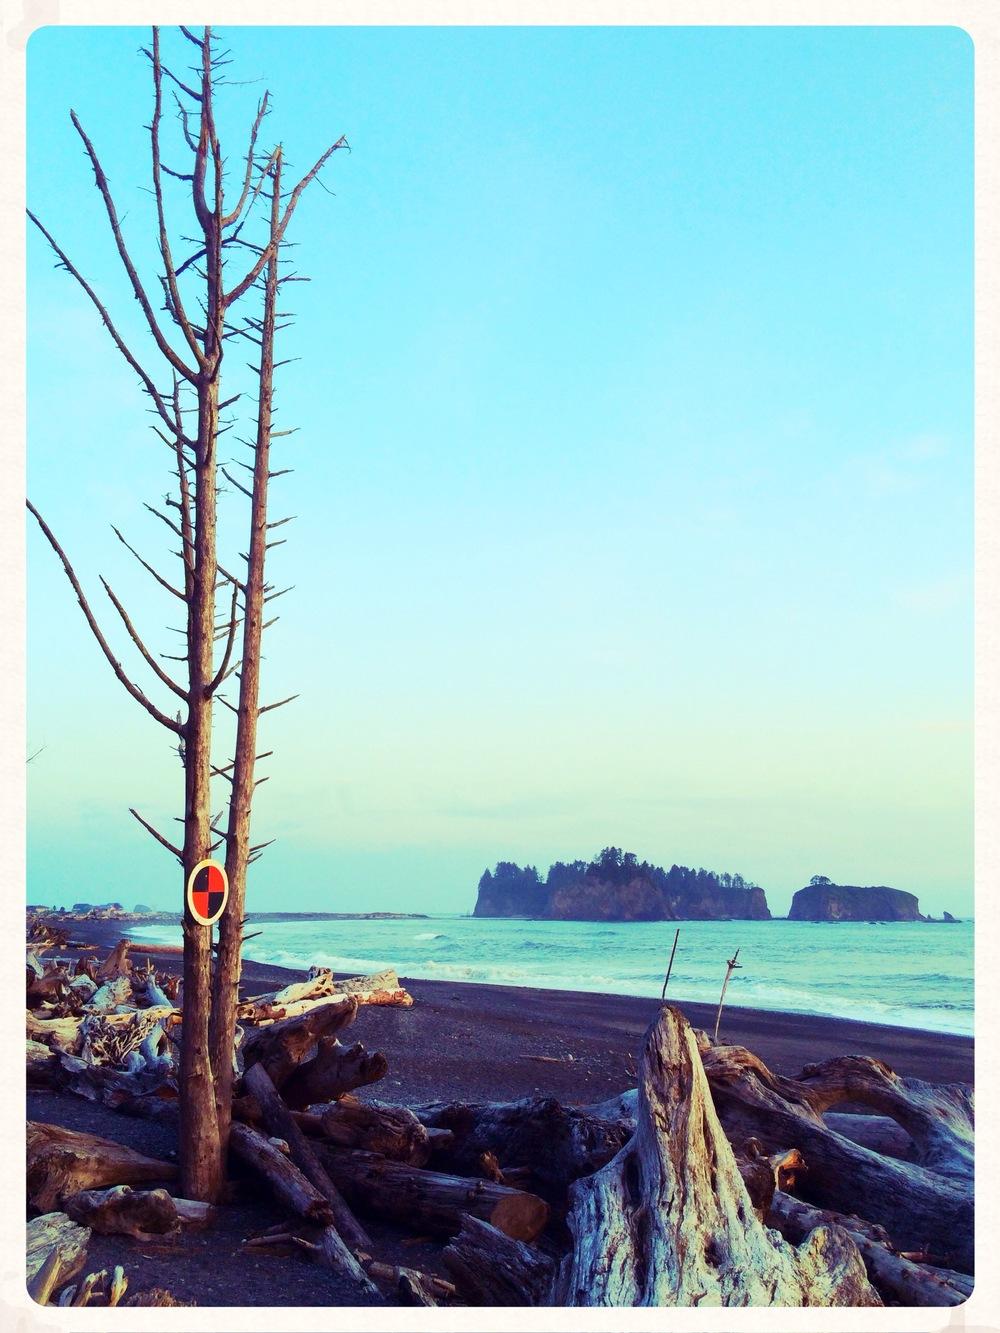 photo (4) copy 2.JPG